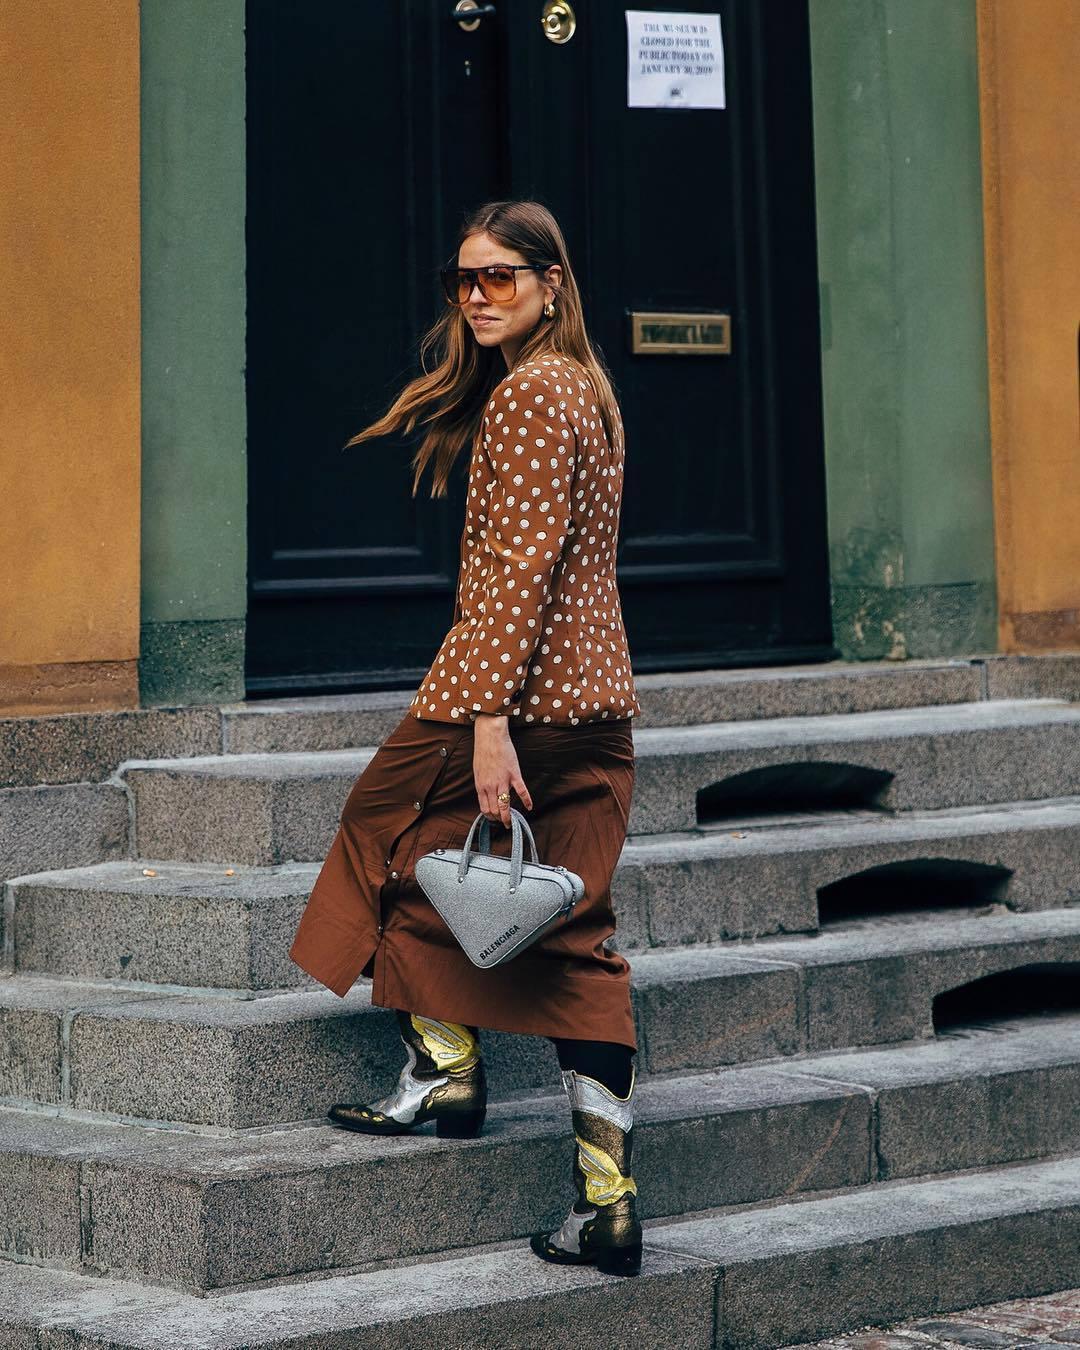 bag grey bag balenciaga knee high boots cowboy boots midi skirt brown skirt blazer sunglasses